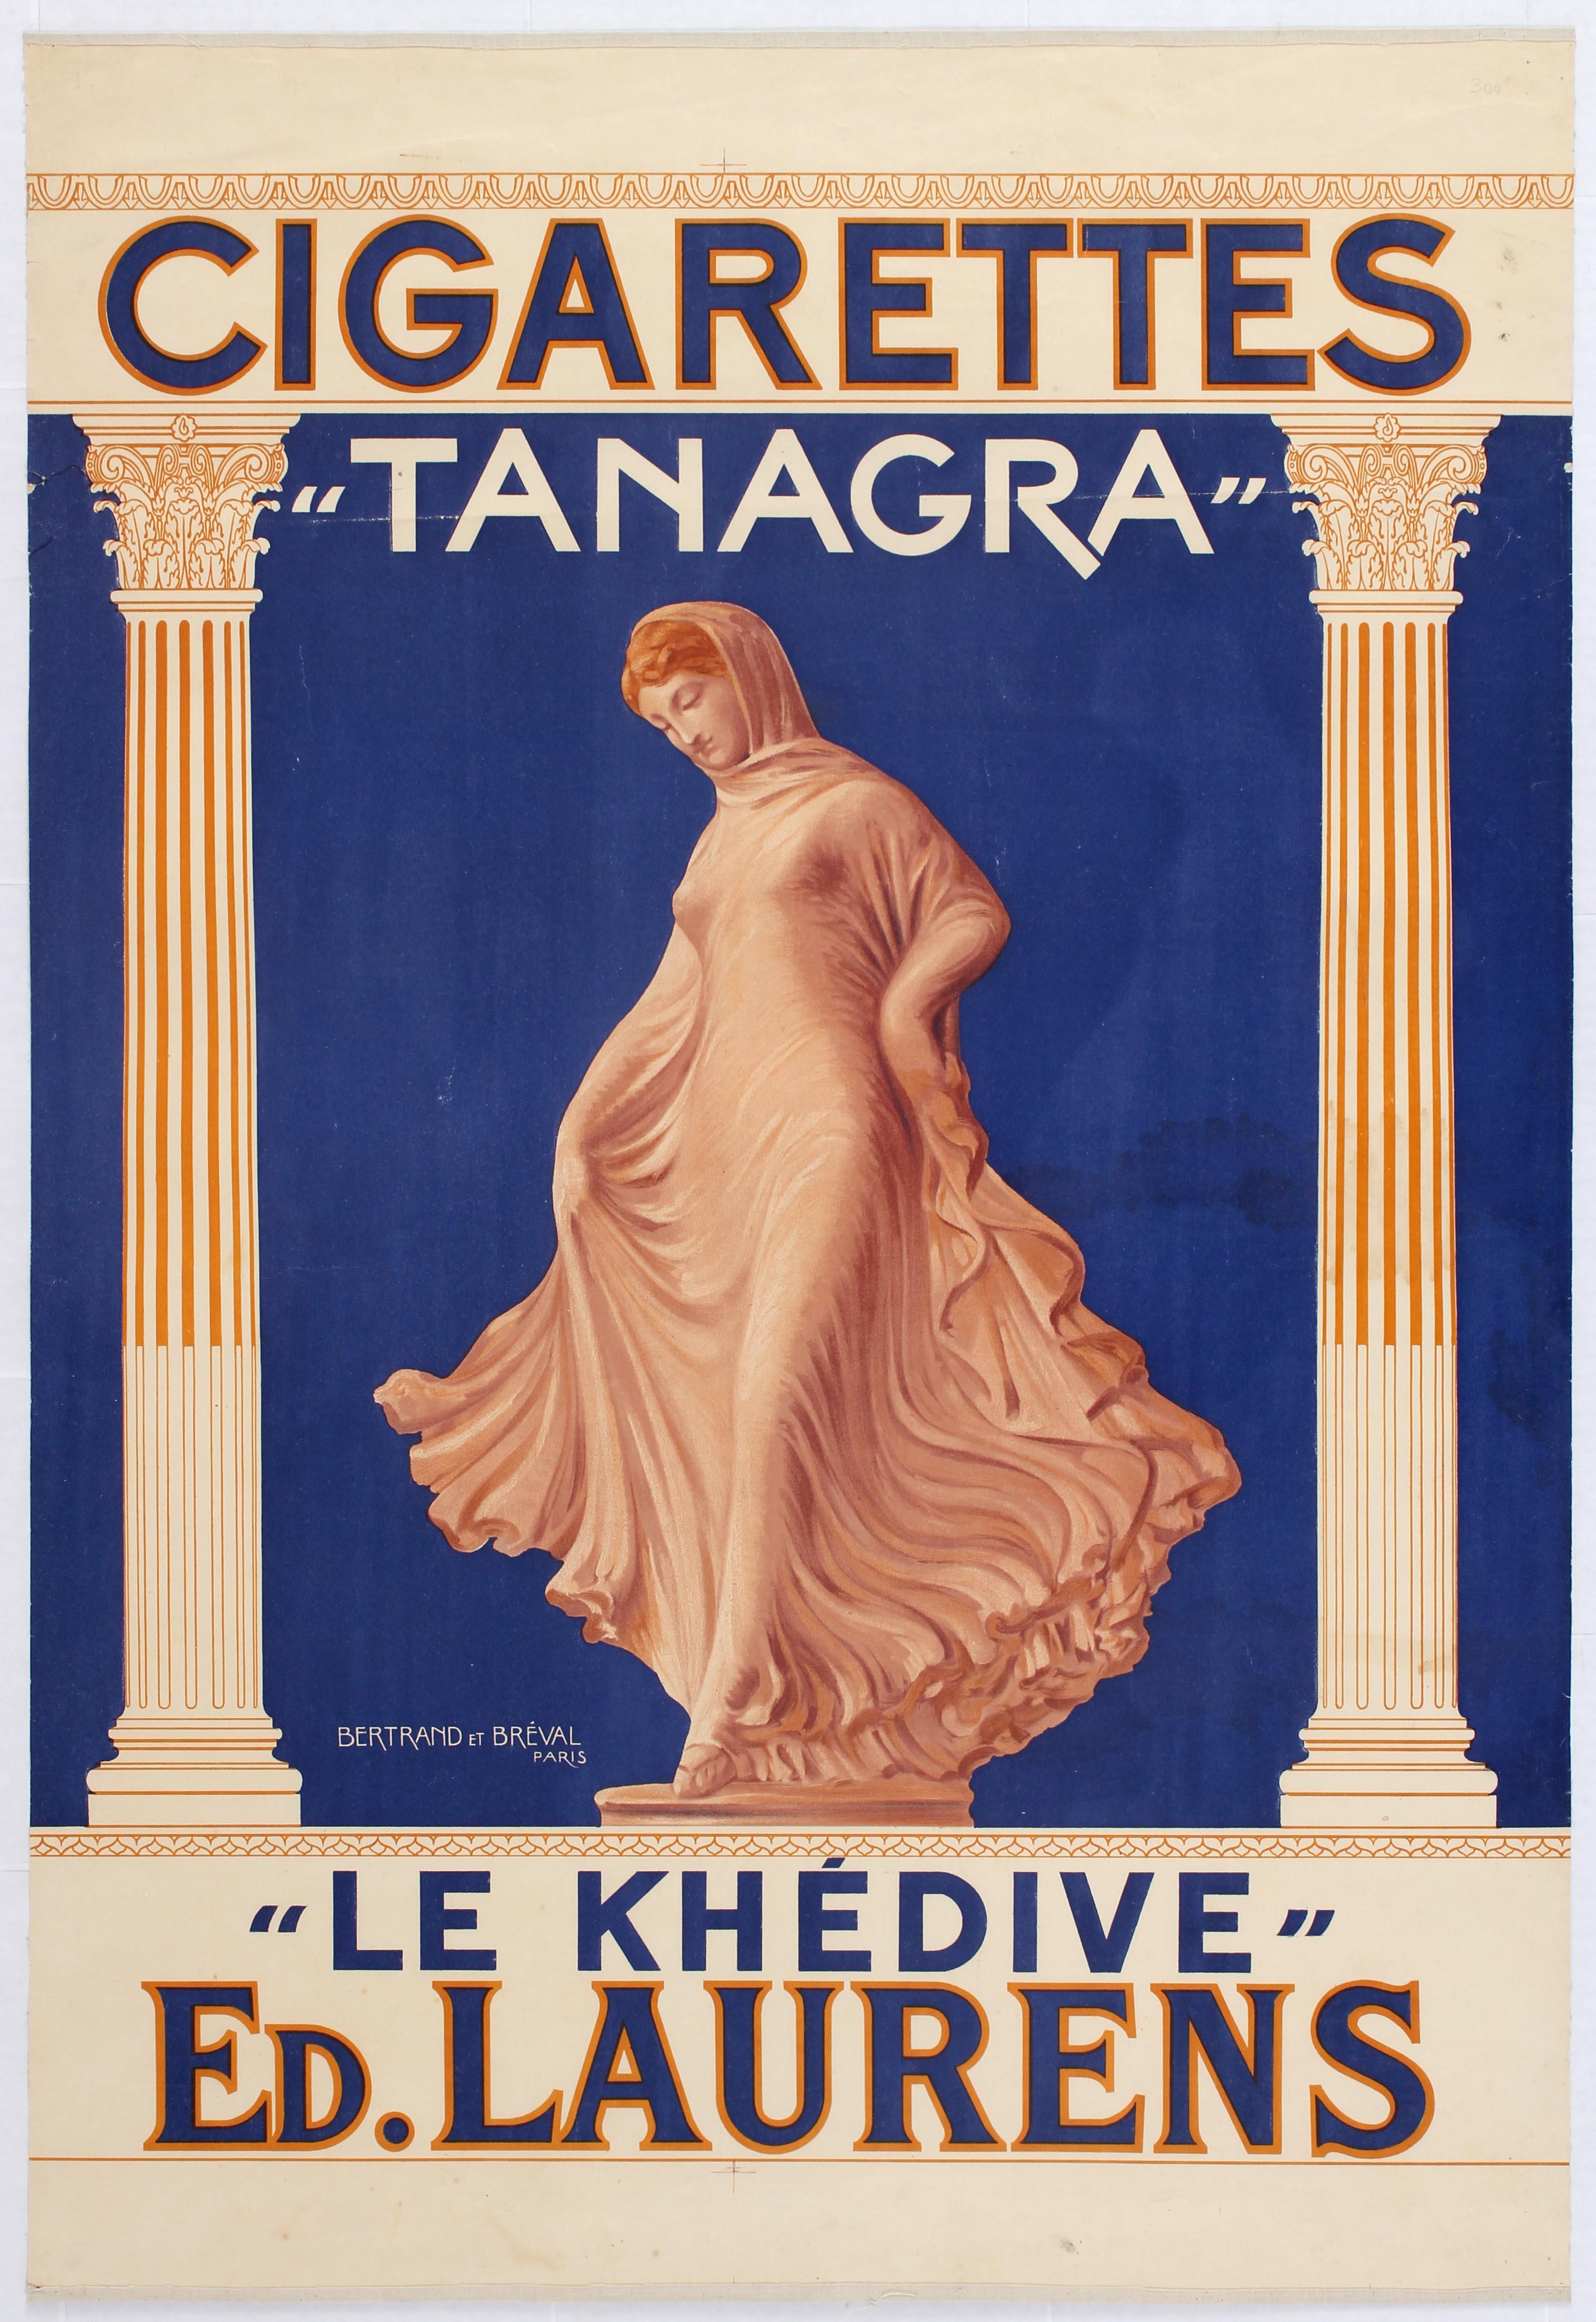 Lot 1011 - Advertising Poster Cigarettes Tanagra France